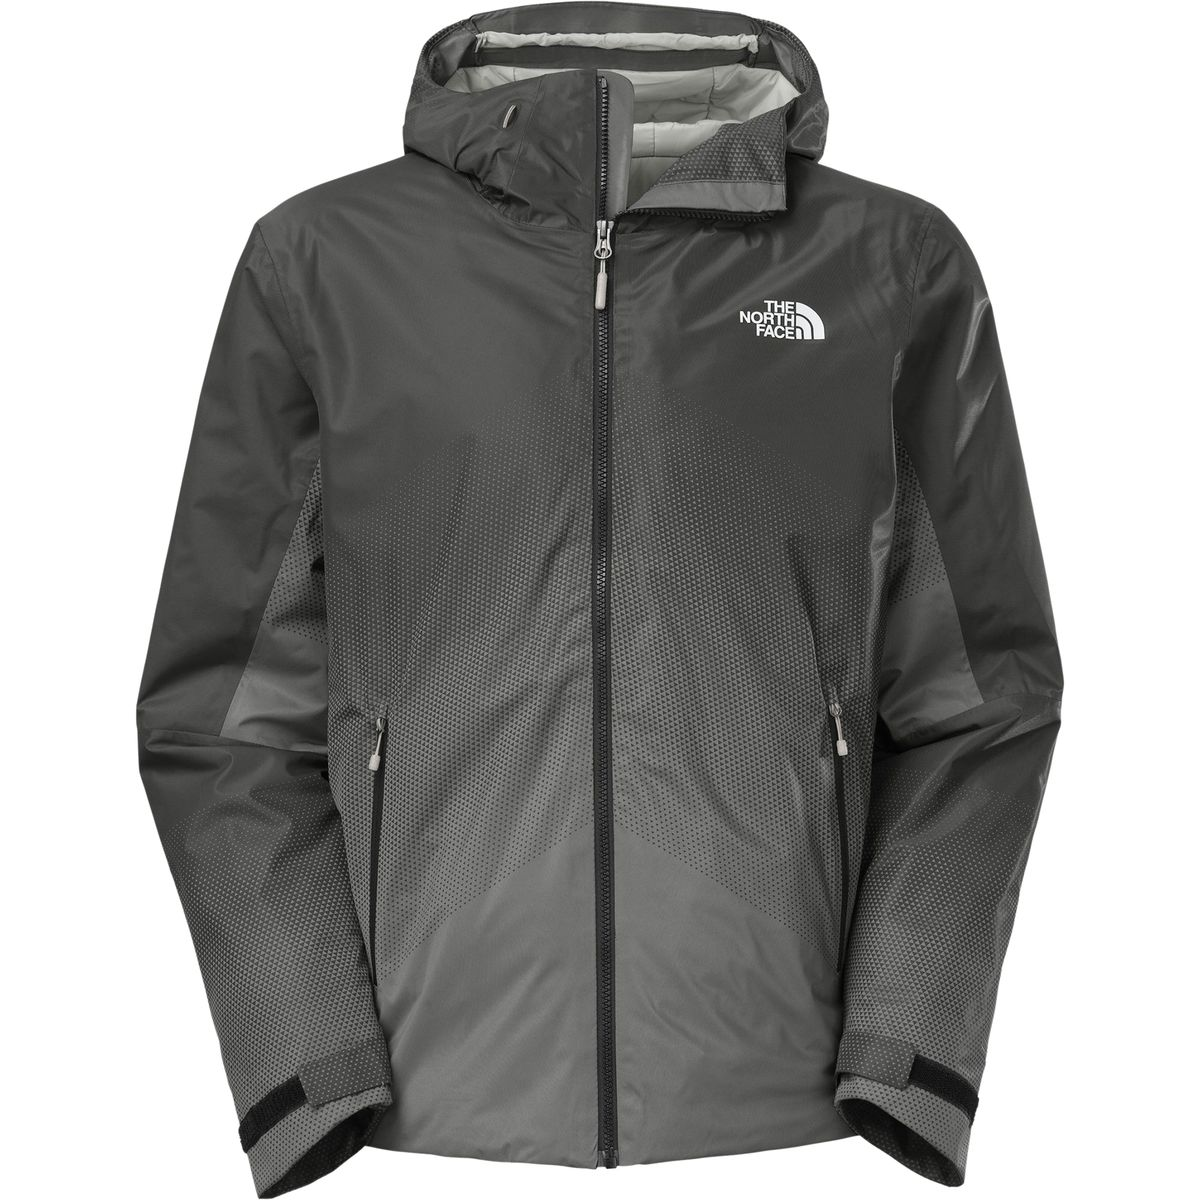 The North Face FuseForm Dot Matrix Insulated Jacket - Men